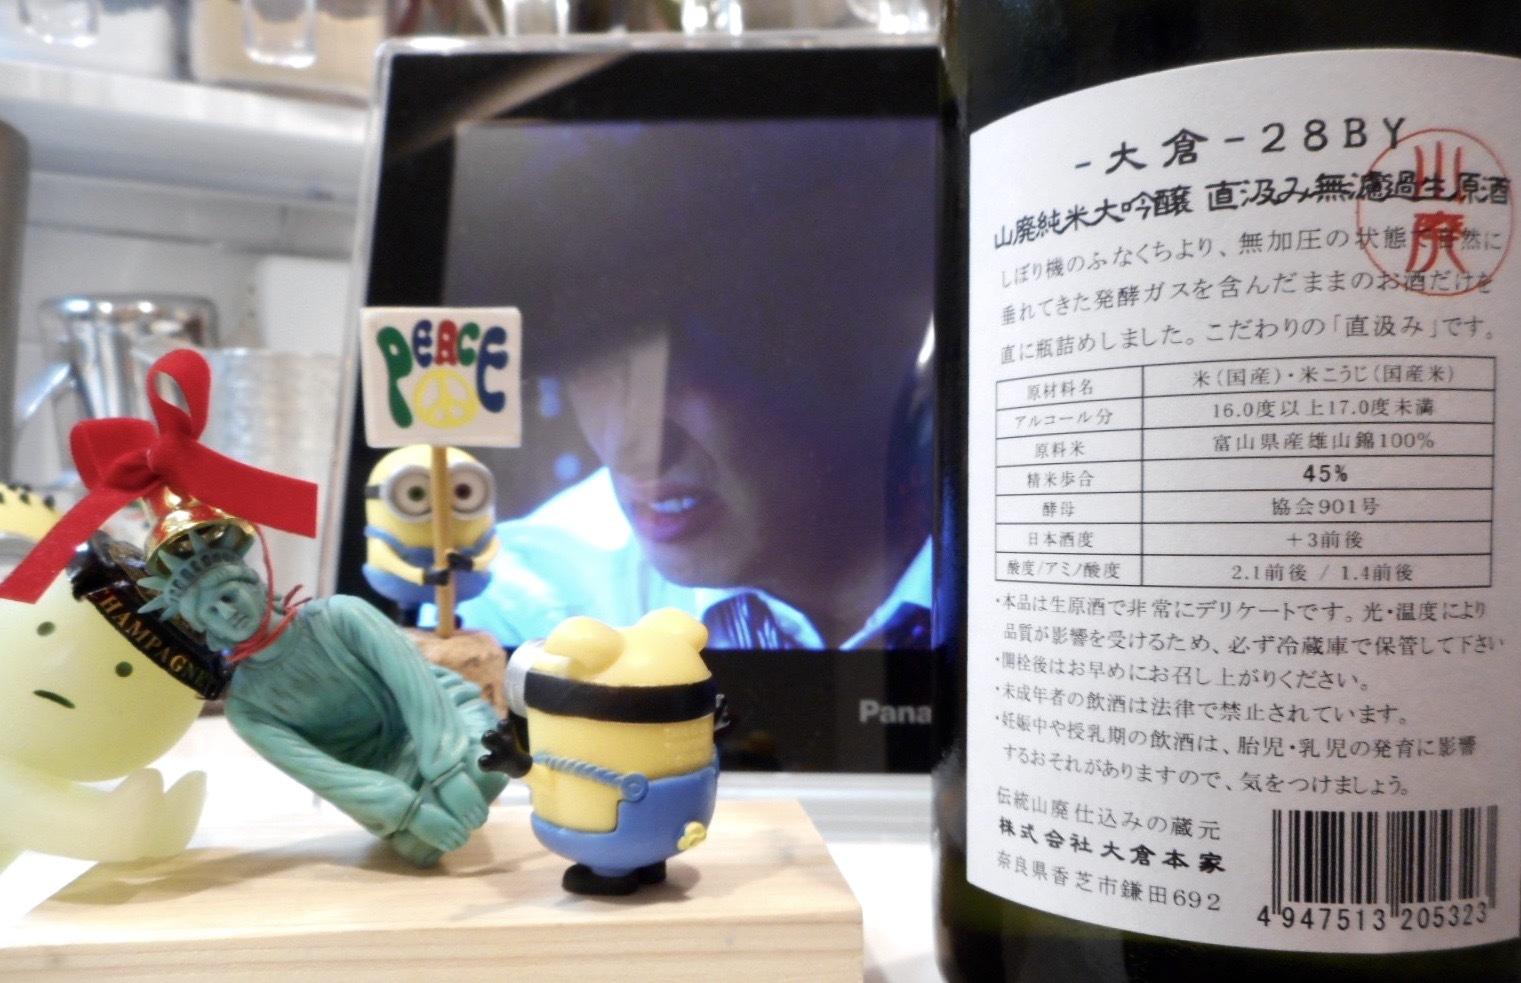 ookura_oyamanishiki45_jikagumi28by2.jpg